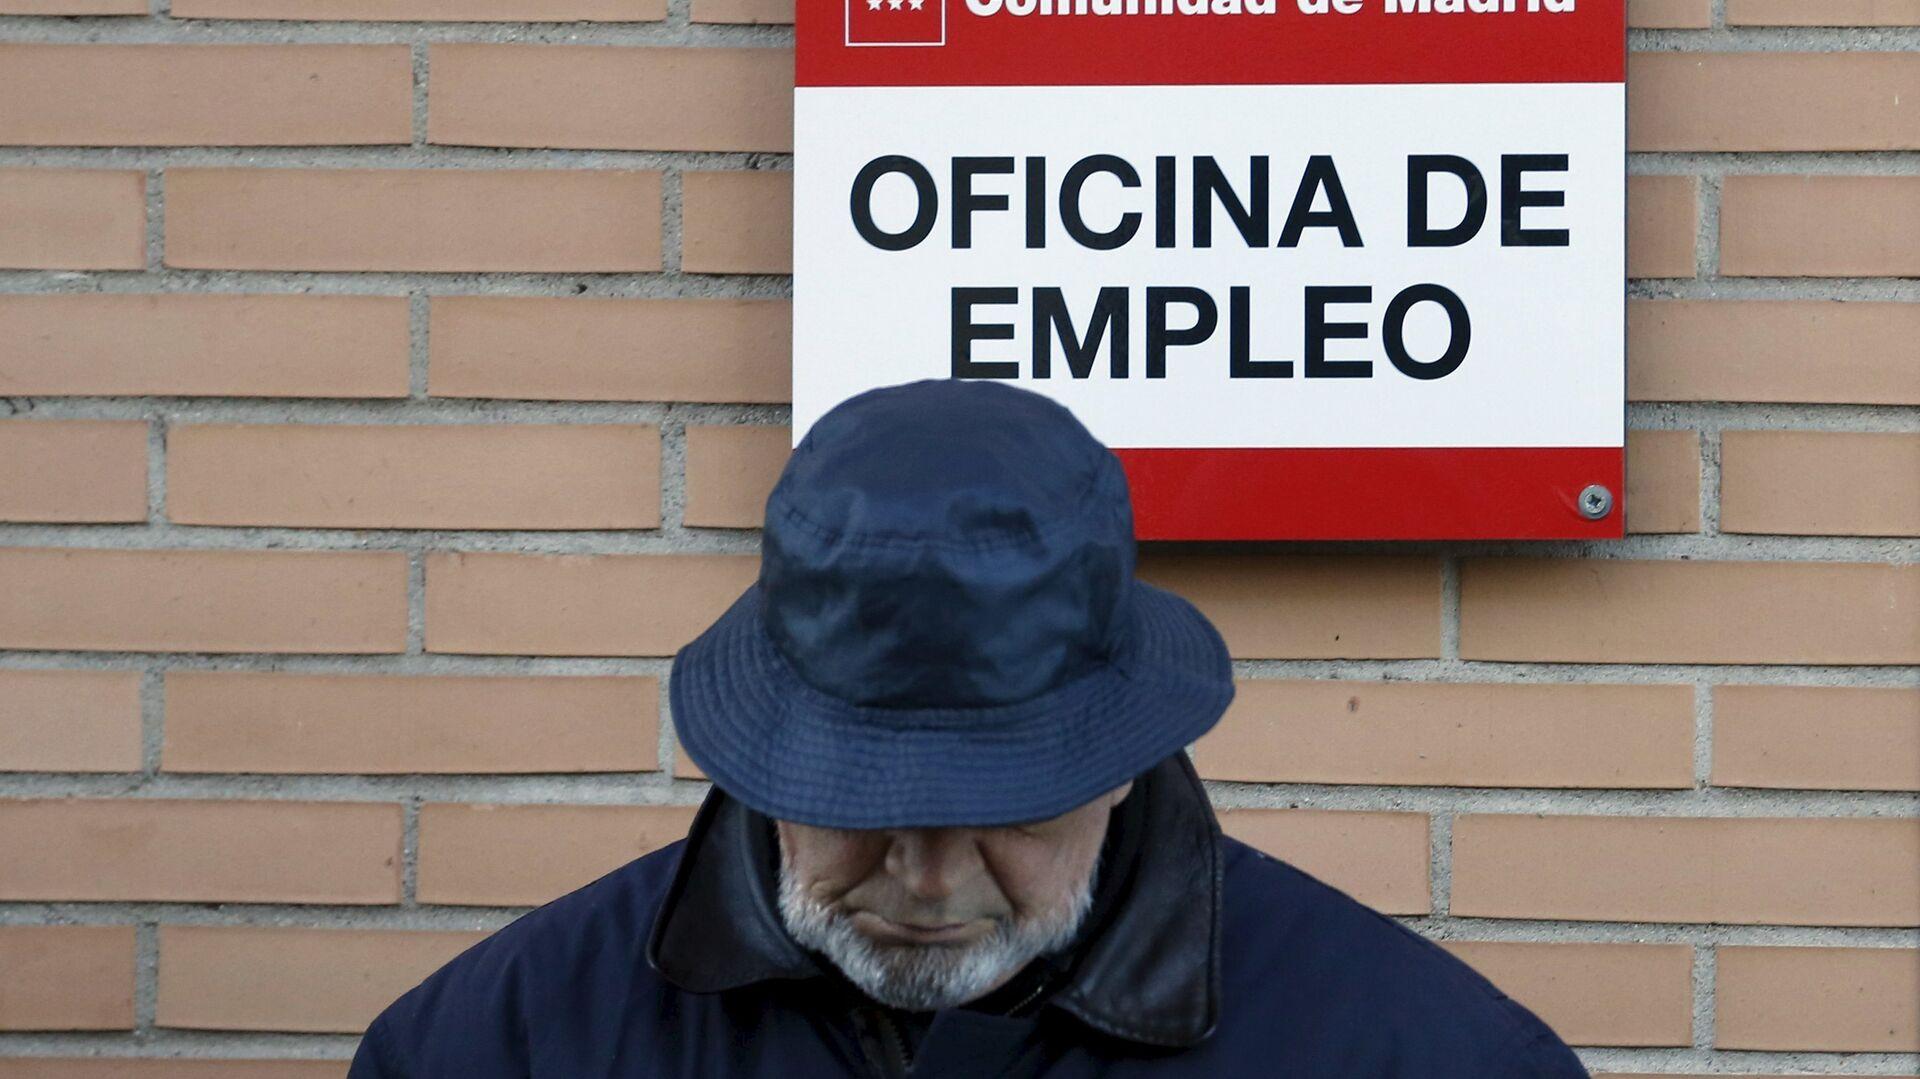 Un hombre cerca de la oficina de empleo en Madrid, España - Sputnik Mundo, 1920, 28.09.2021